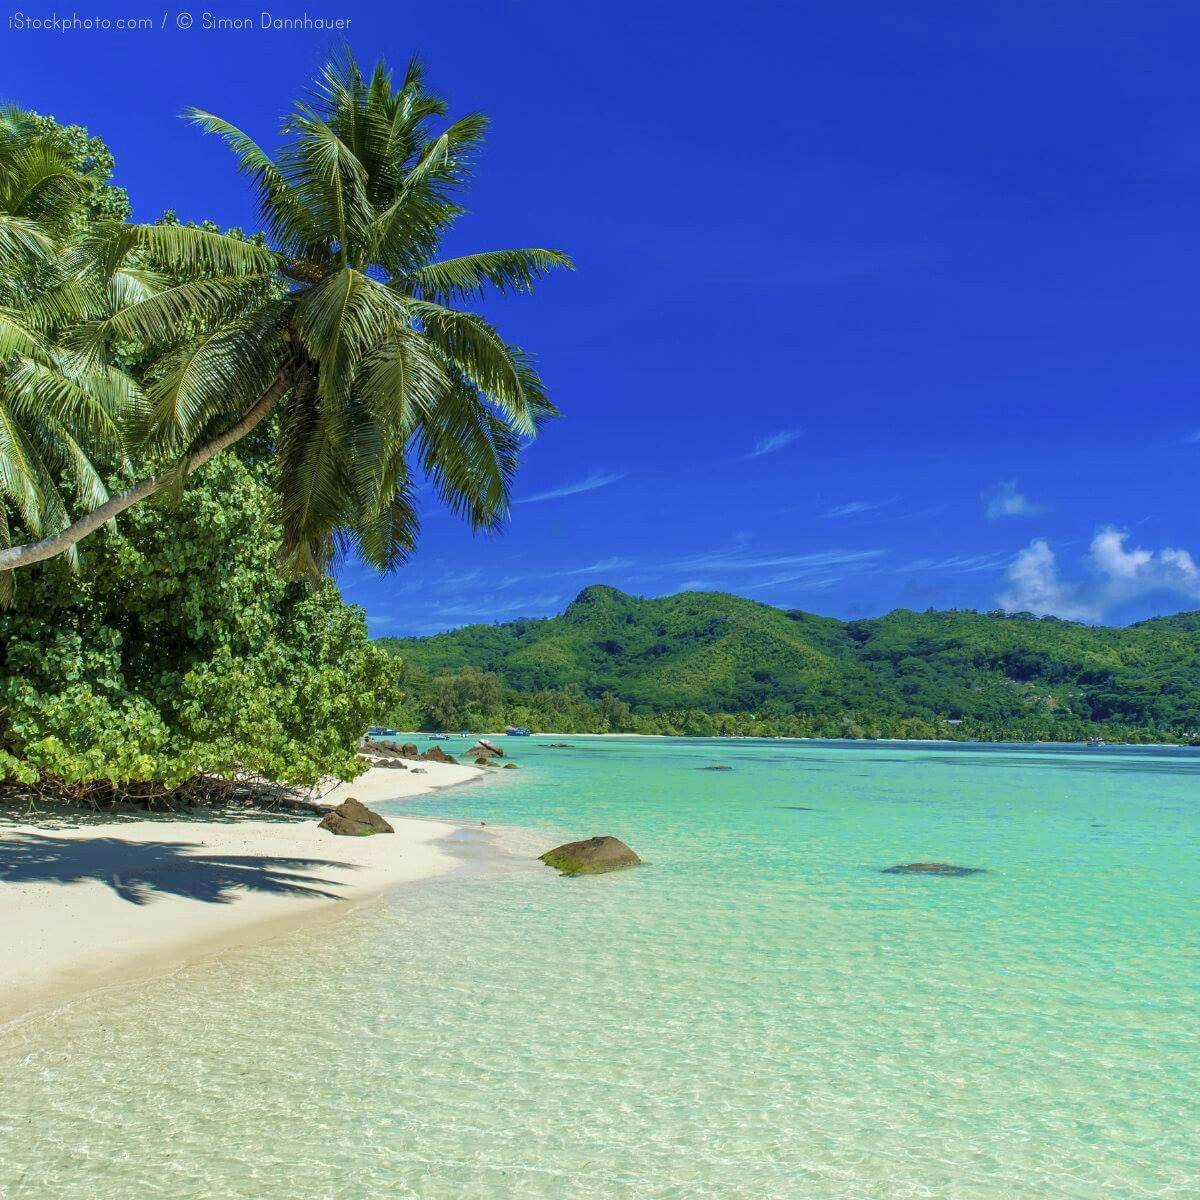 Seychelles Island Beaches: Seychelles, Seychelles Islands, Beach